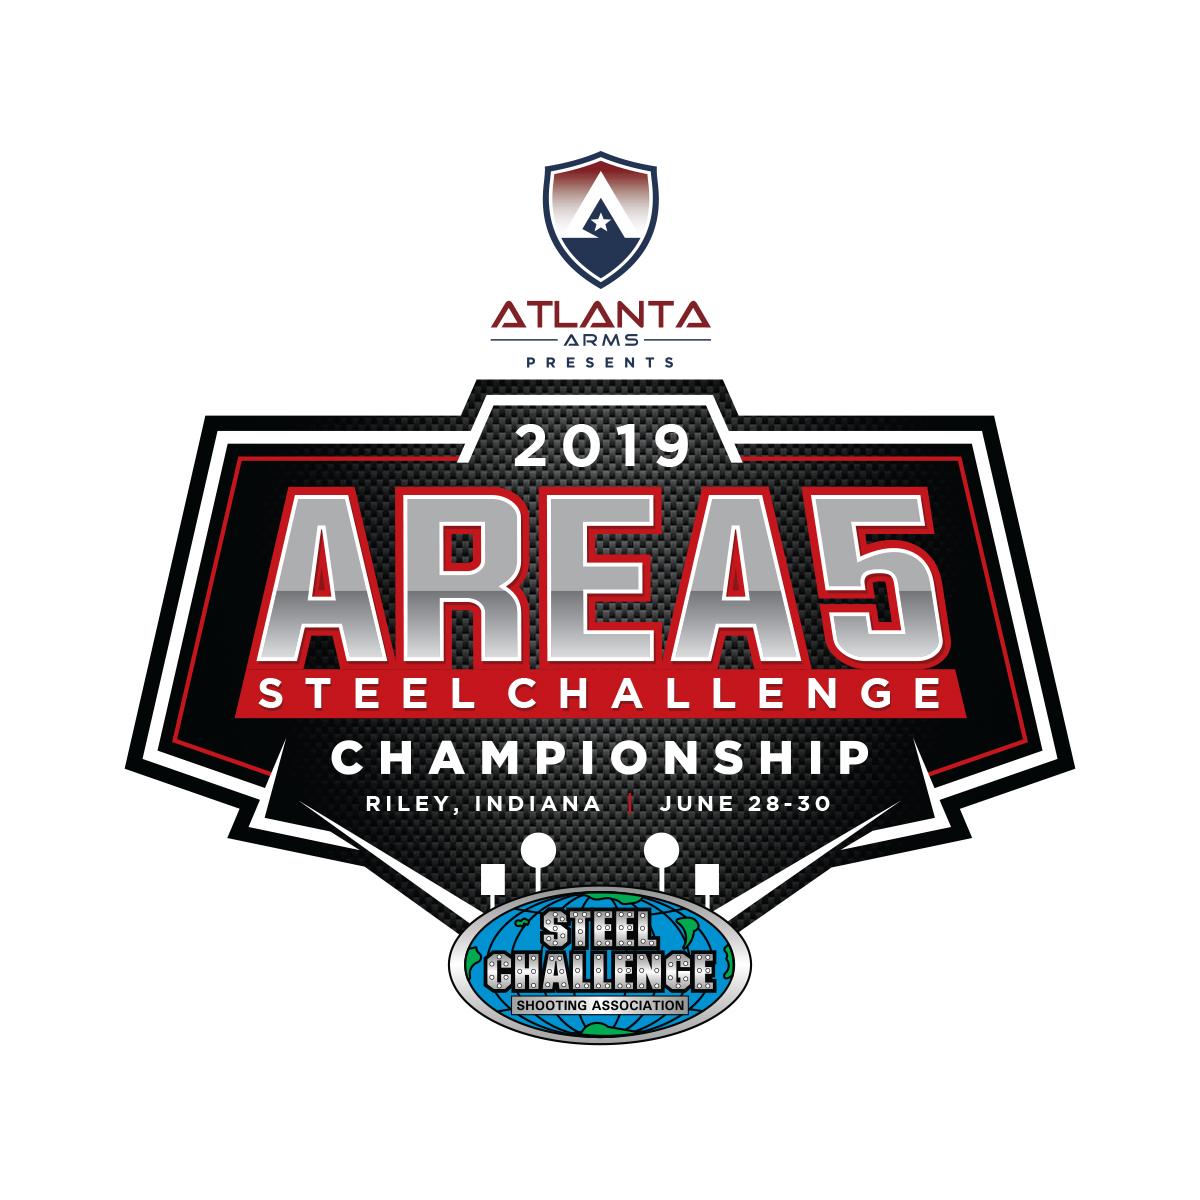 2019 Area 5 Steel Challenge Championship